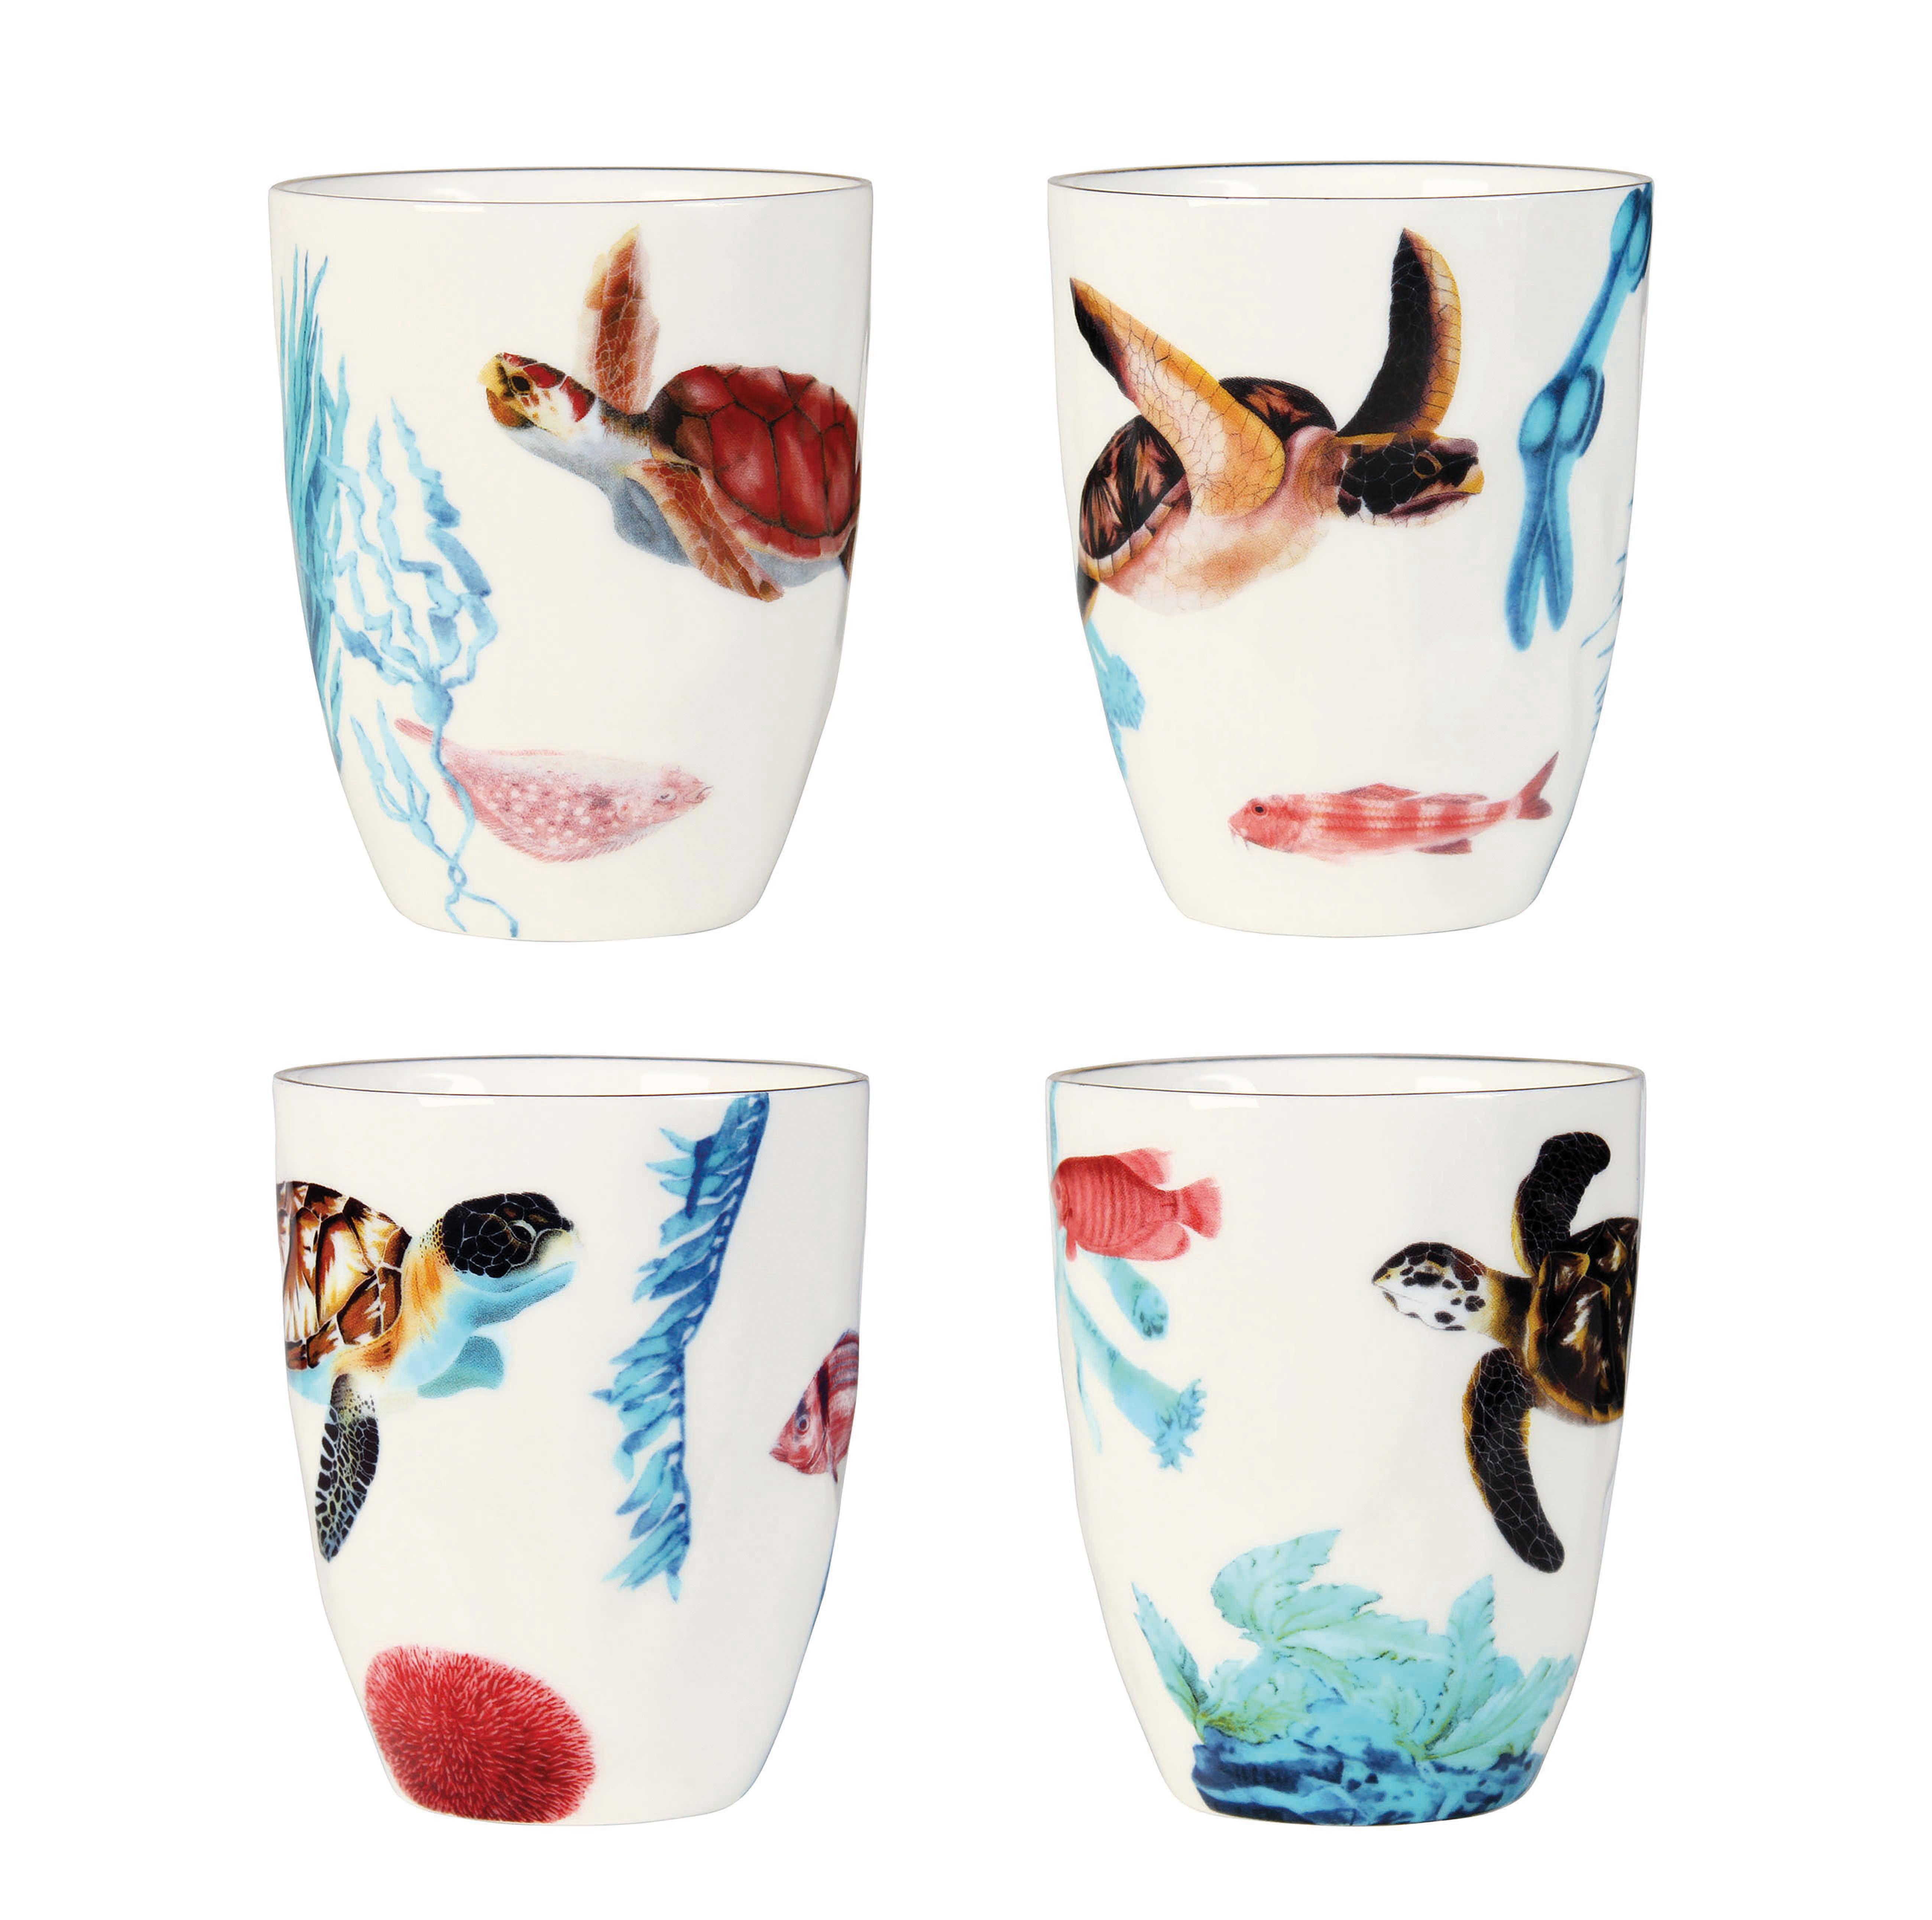 Tableware - Coffee Mugs & Tea Cups - Océan Mug - / Set of 4 - Porcelain by & klevering - Ocean / Multicoloured - Porcelaine fine